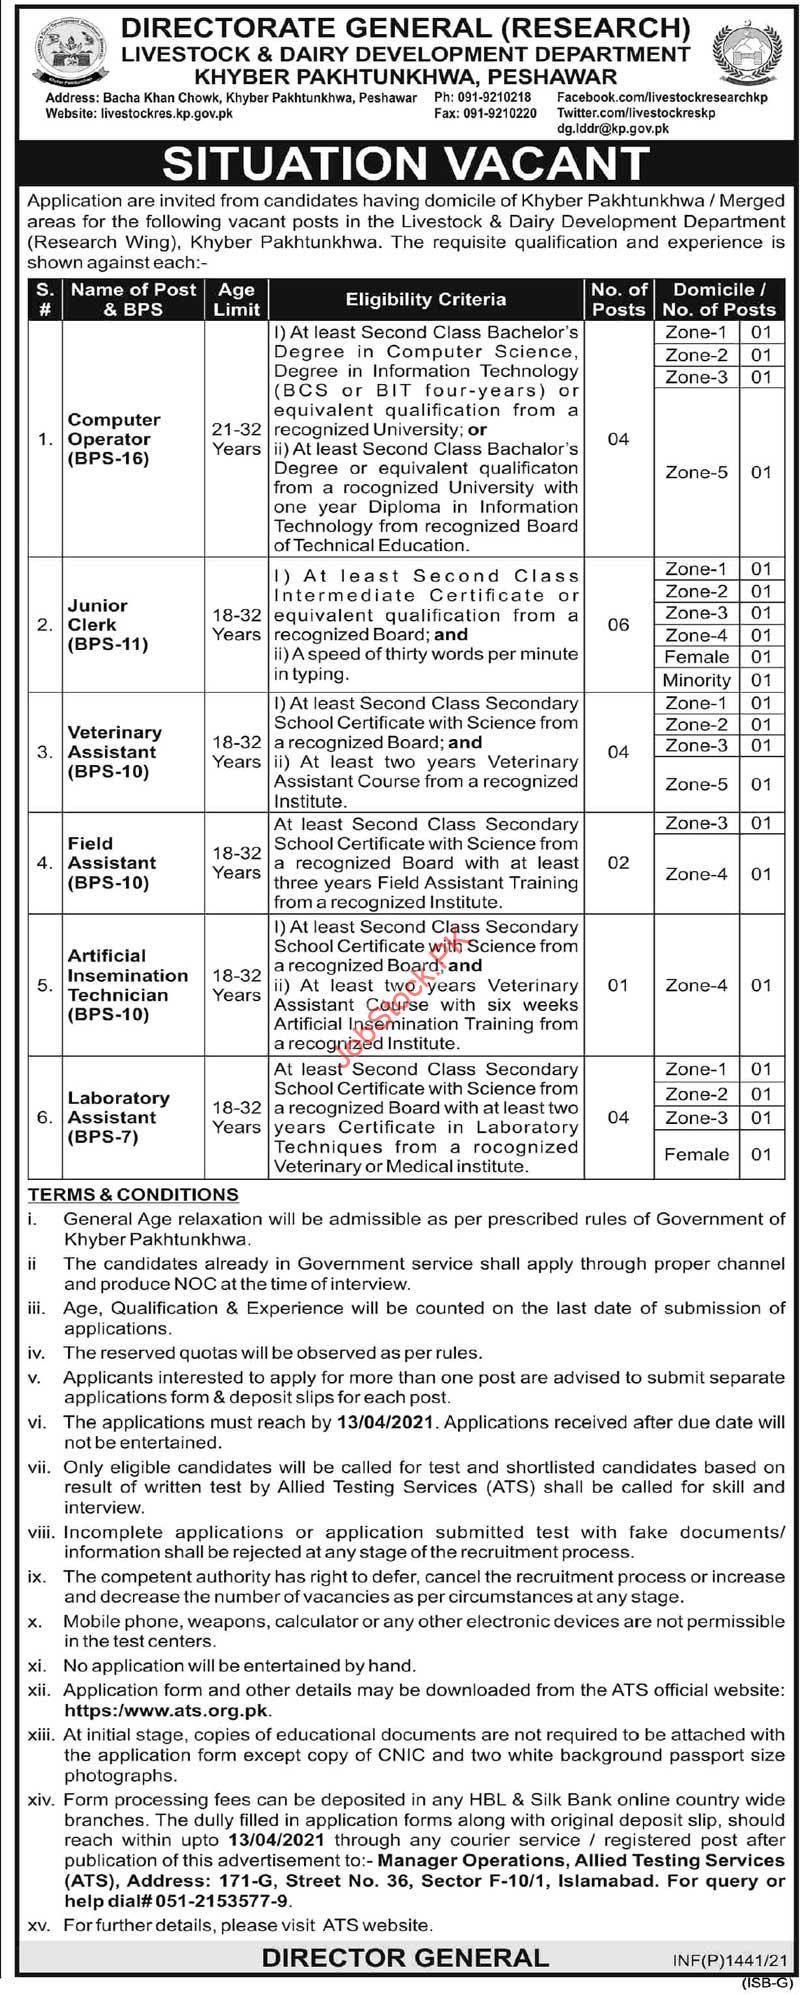 Directorate Of Livestock And Dairy Development Peshawar Jobs 2021